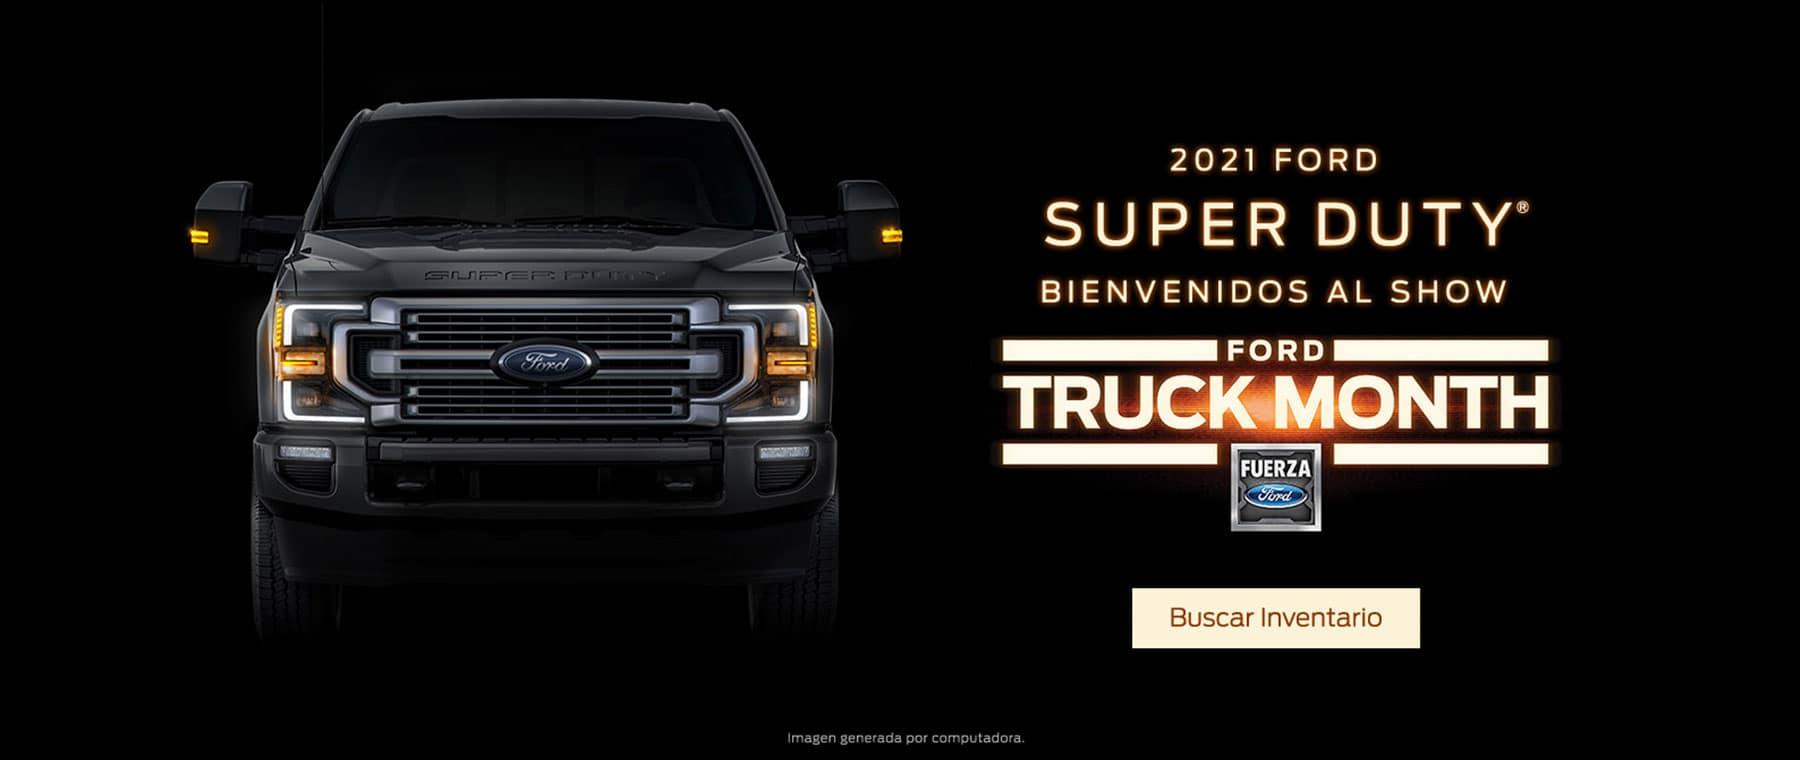 2021_TruckMnth_SuperDuty-1800×760 Spanish